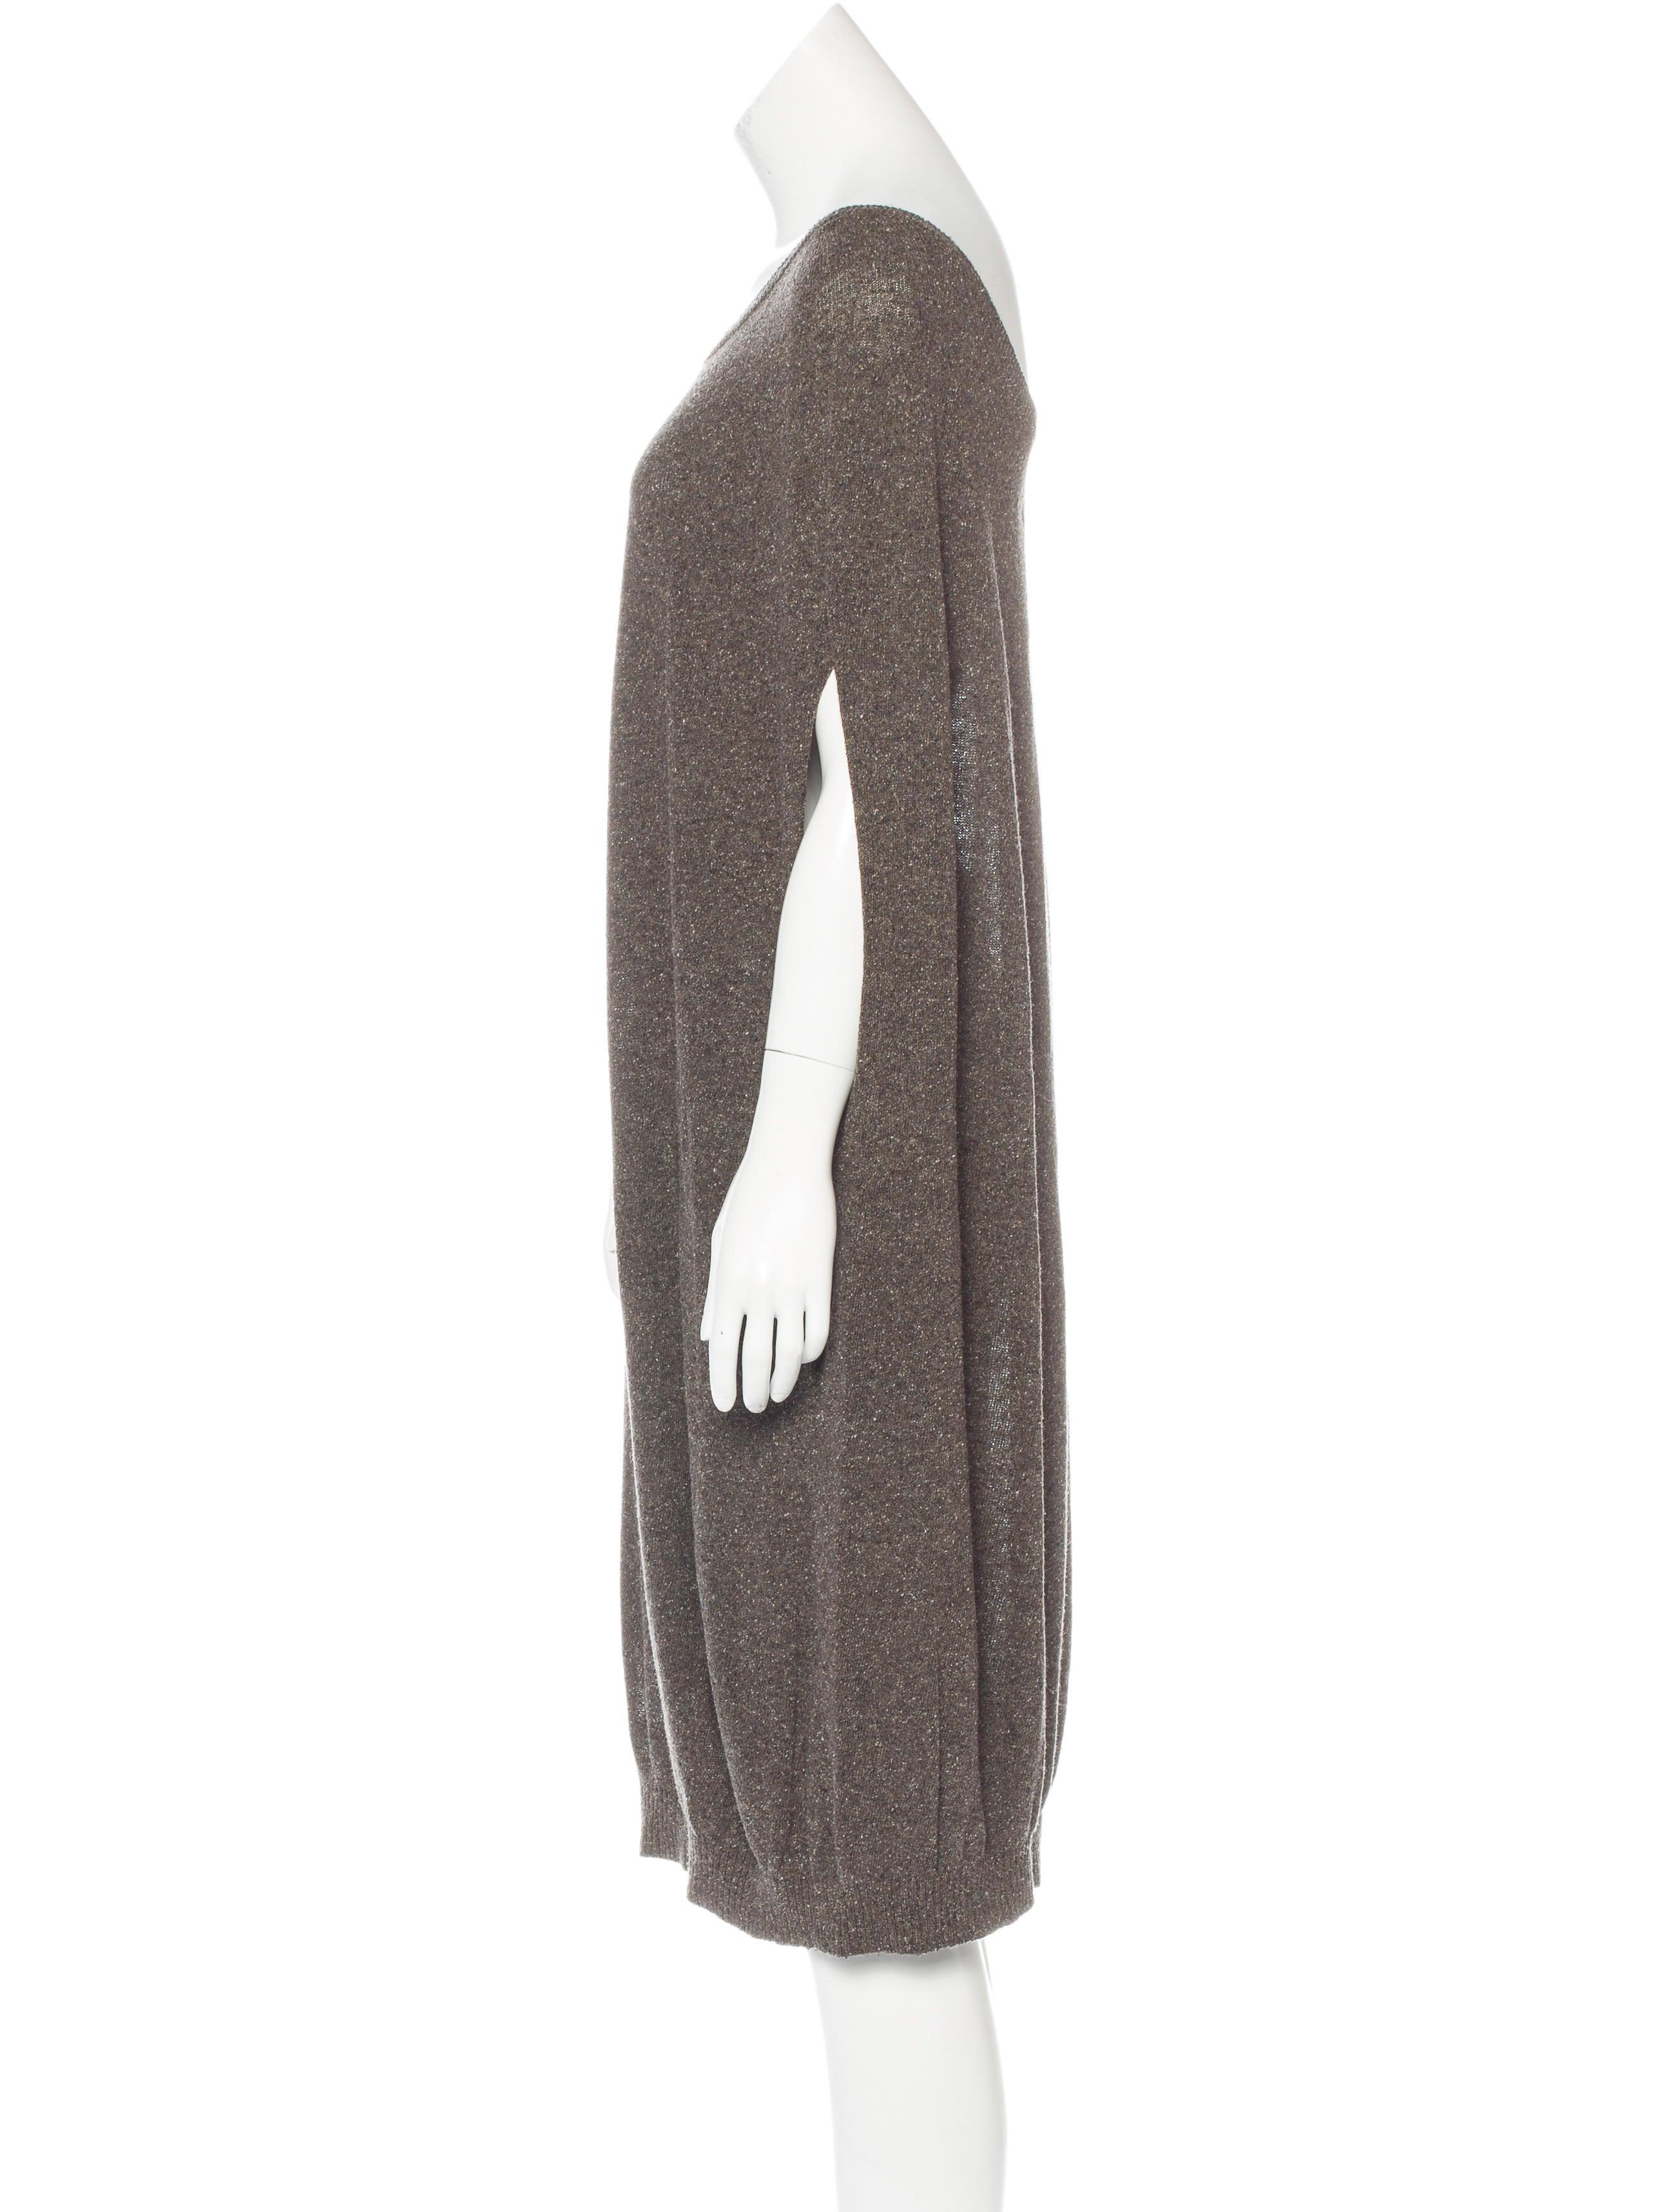 Cosmic wonder light source oversize sweater dress for Cosmic pattern clothing